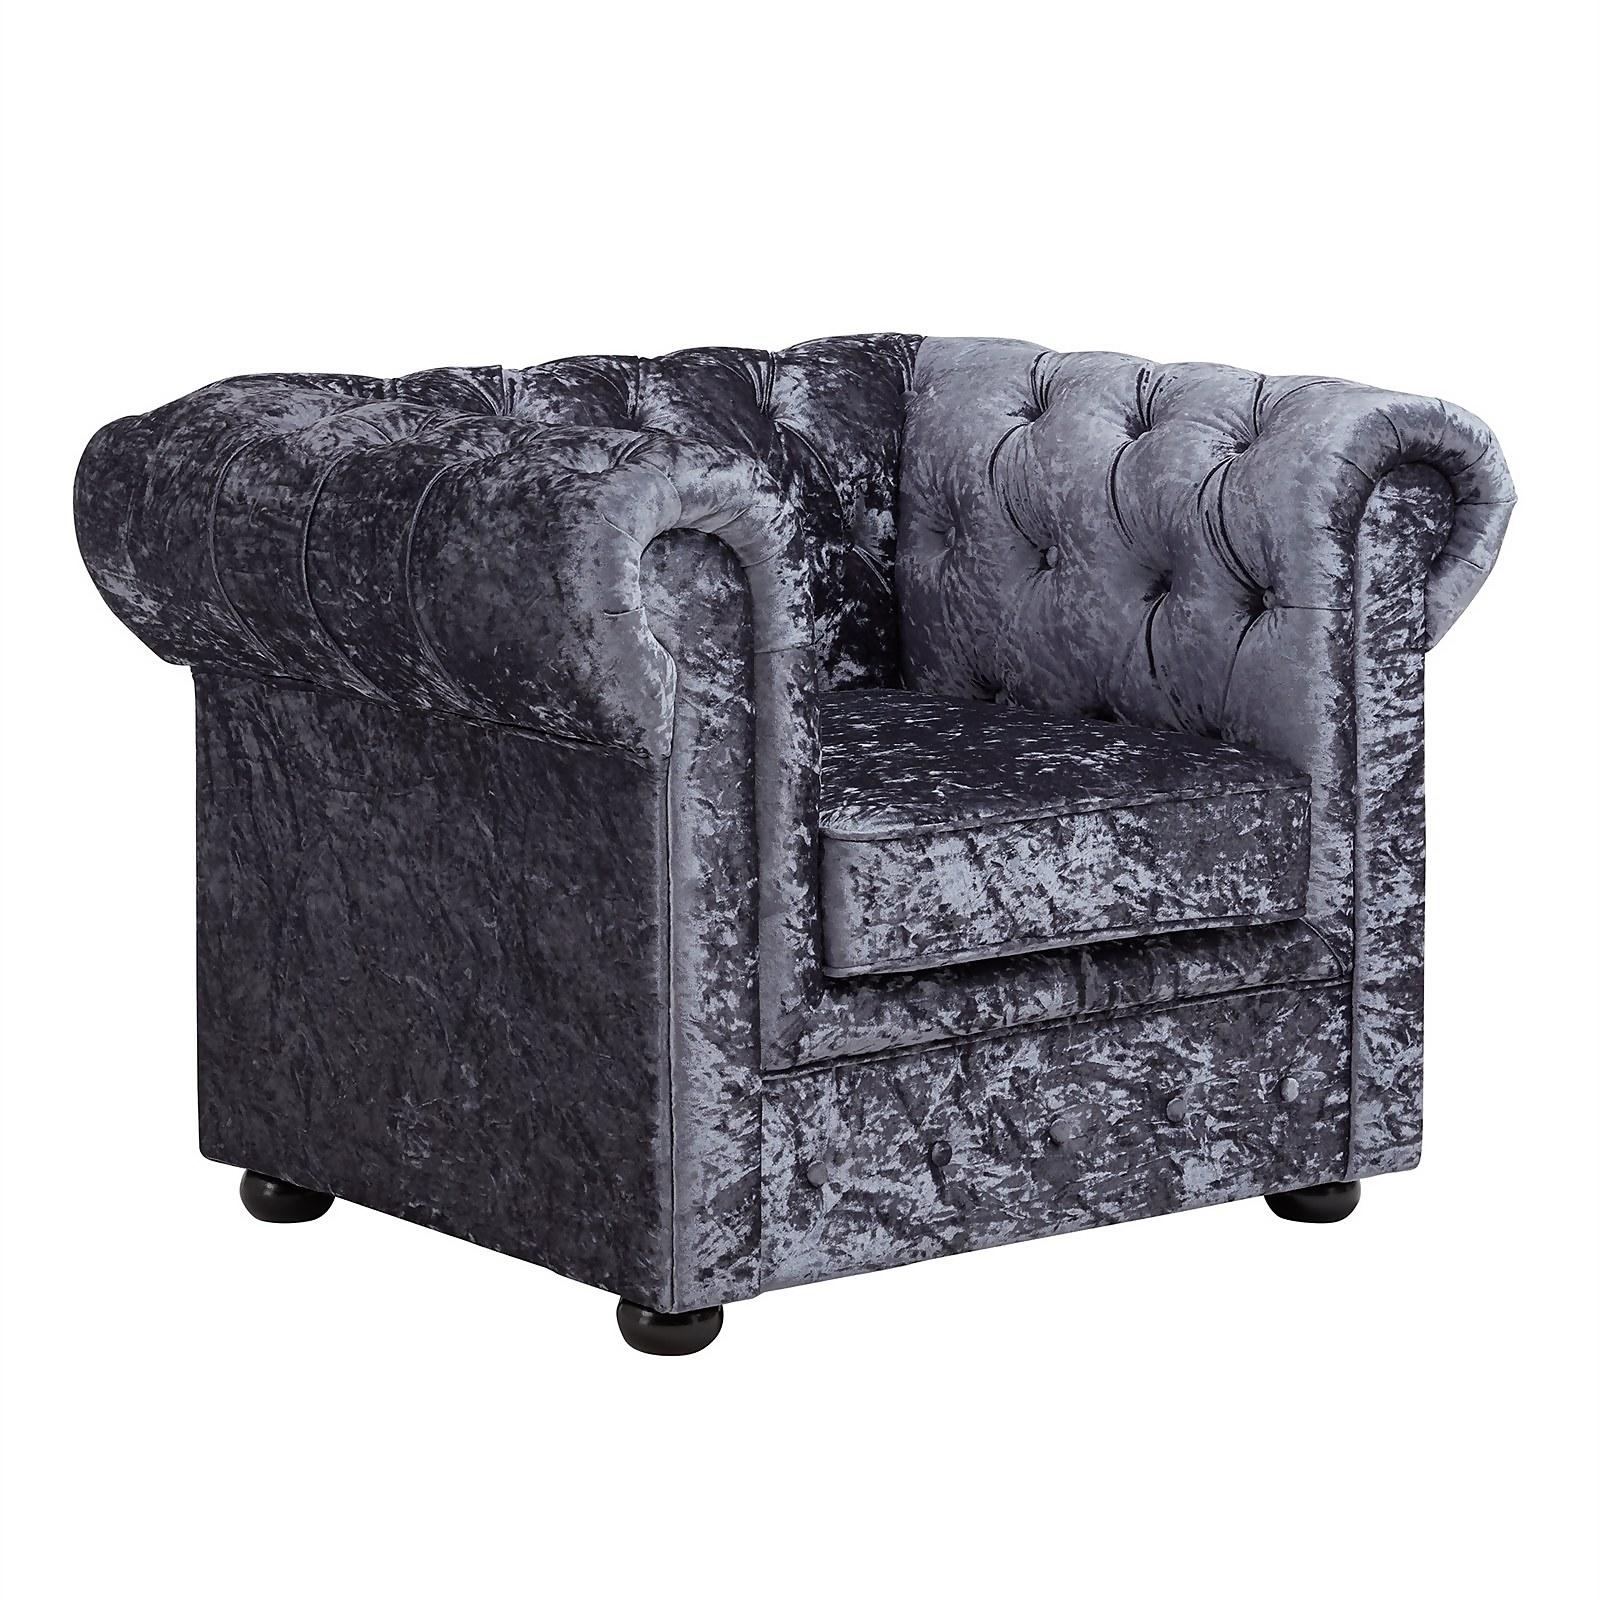 Chesterfield Crushed Velvet Armchair - Petrol Blue